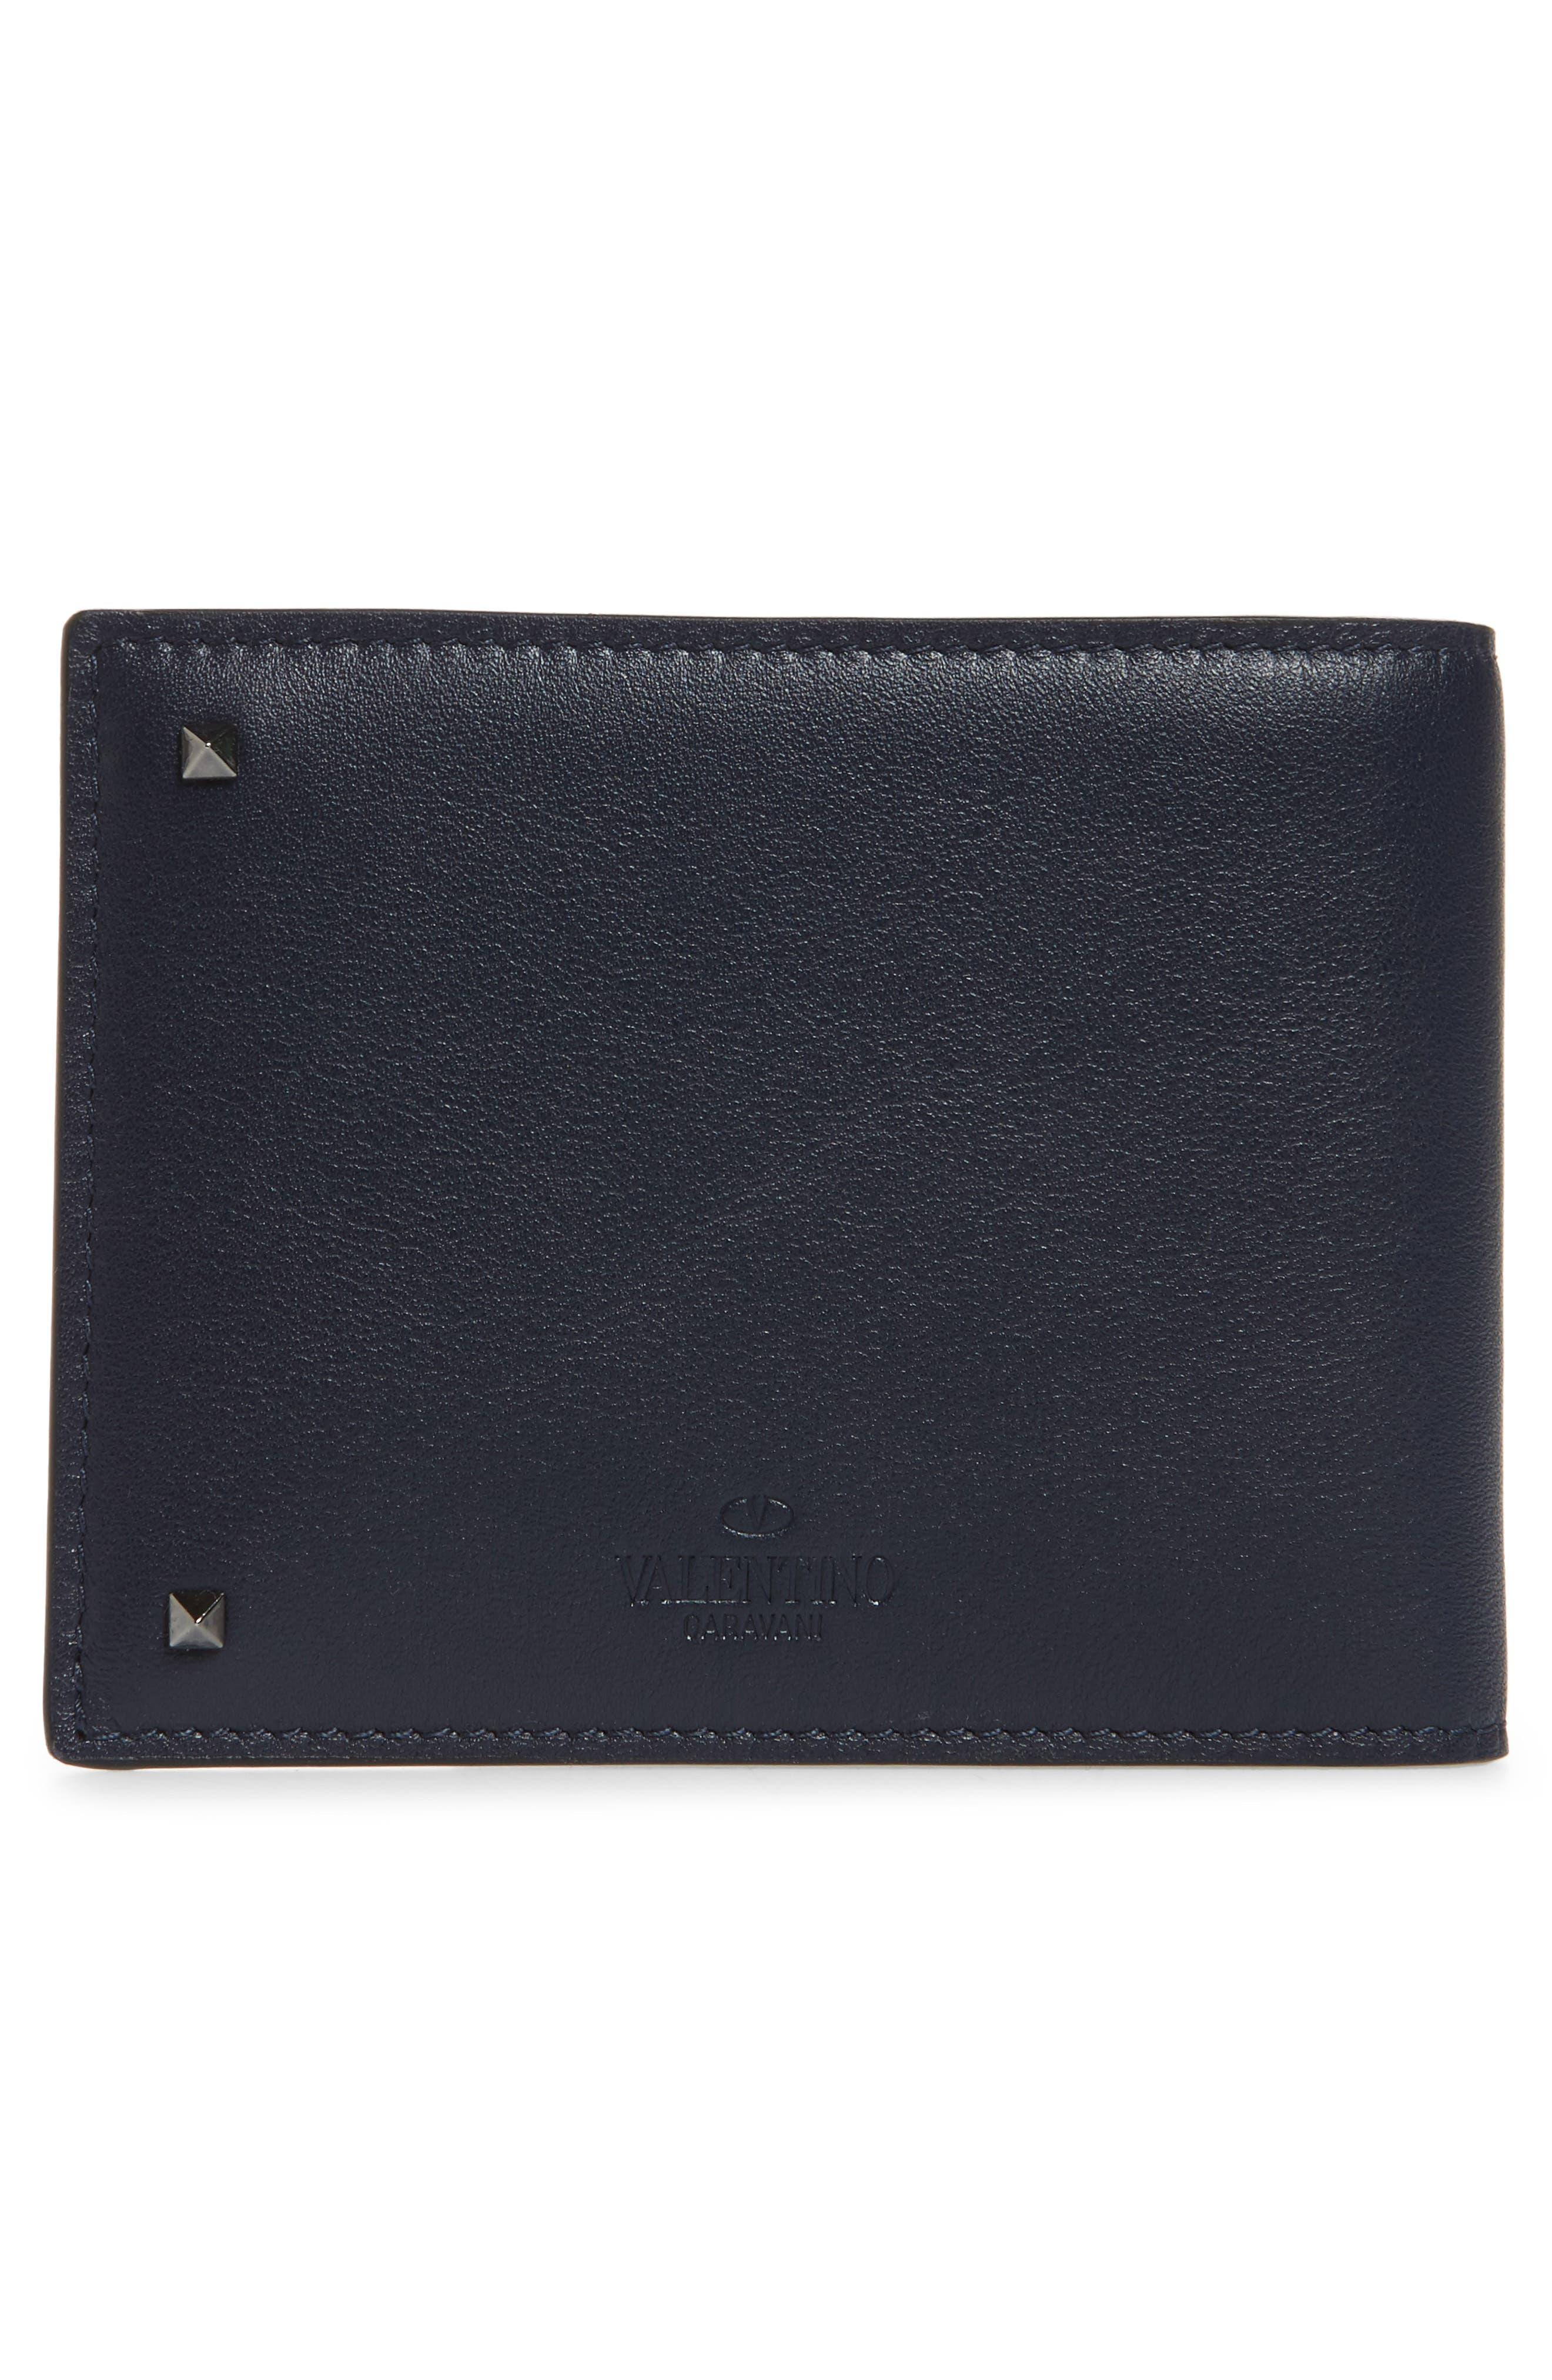 GARAVANI Stud Leather Money Clip Card Case,                             Alternate thumbnail 3, color,                             MARINE